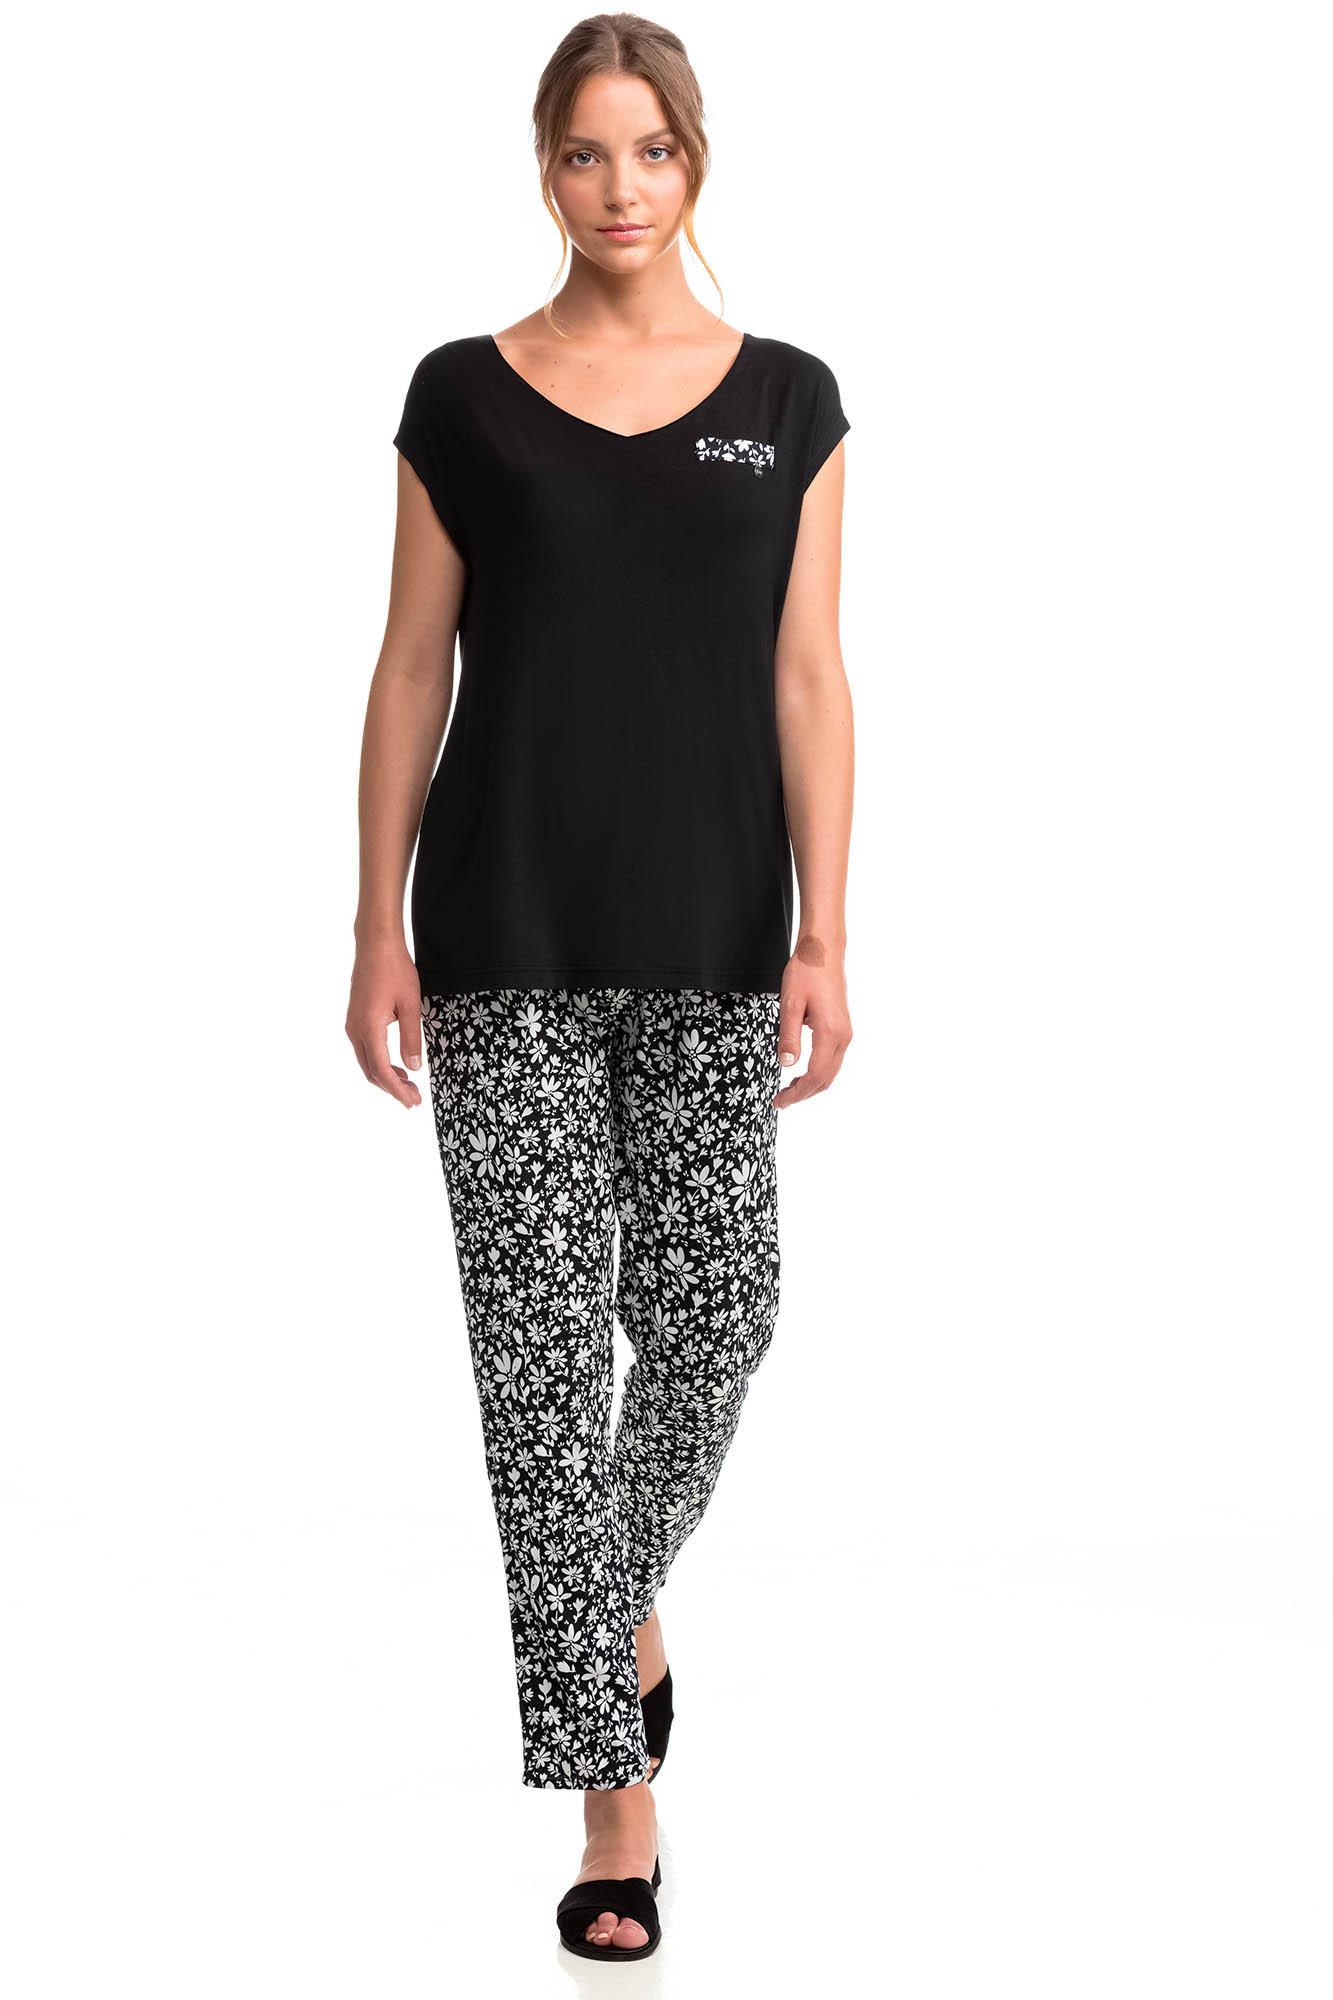 Vamp - Dámske pyžamo 14061 - Vamp black l